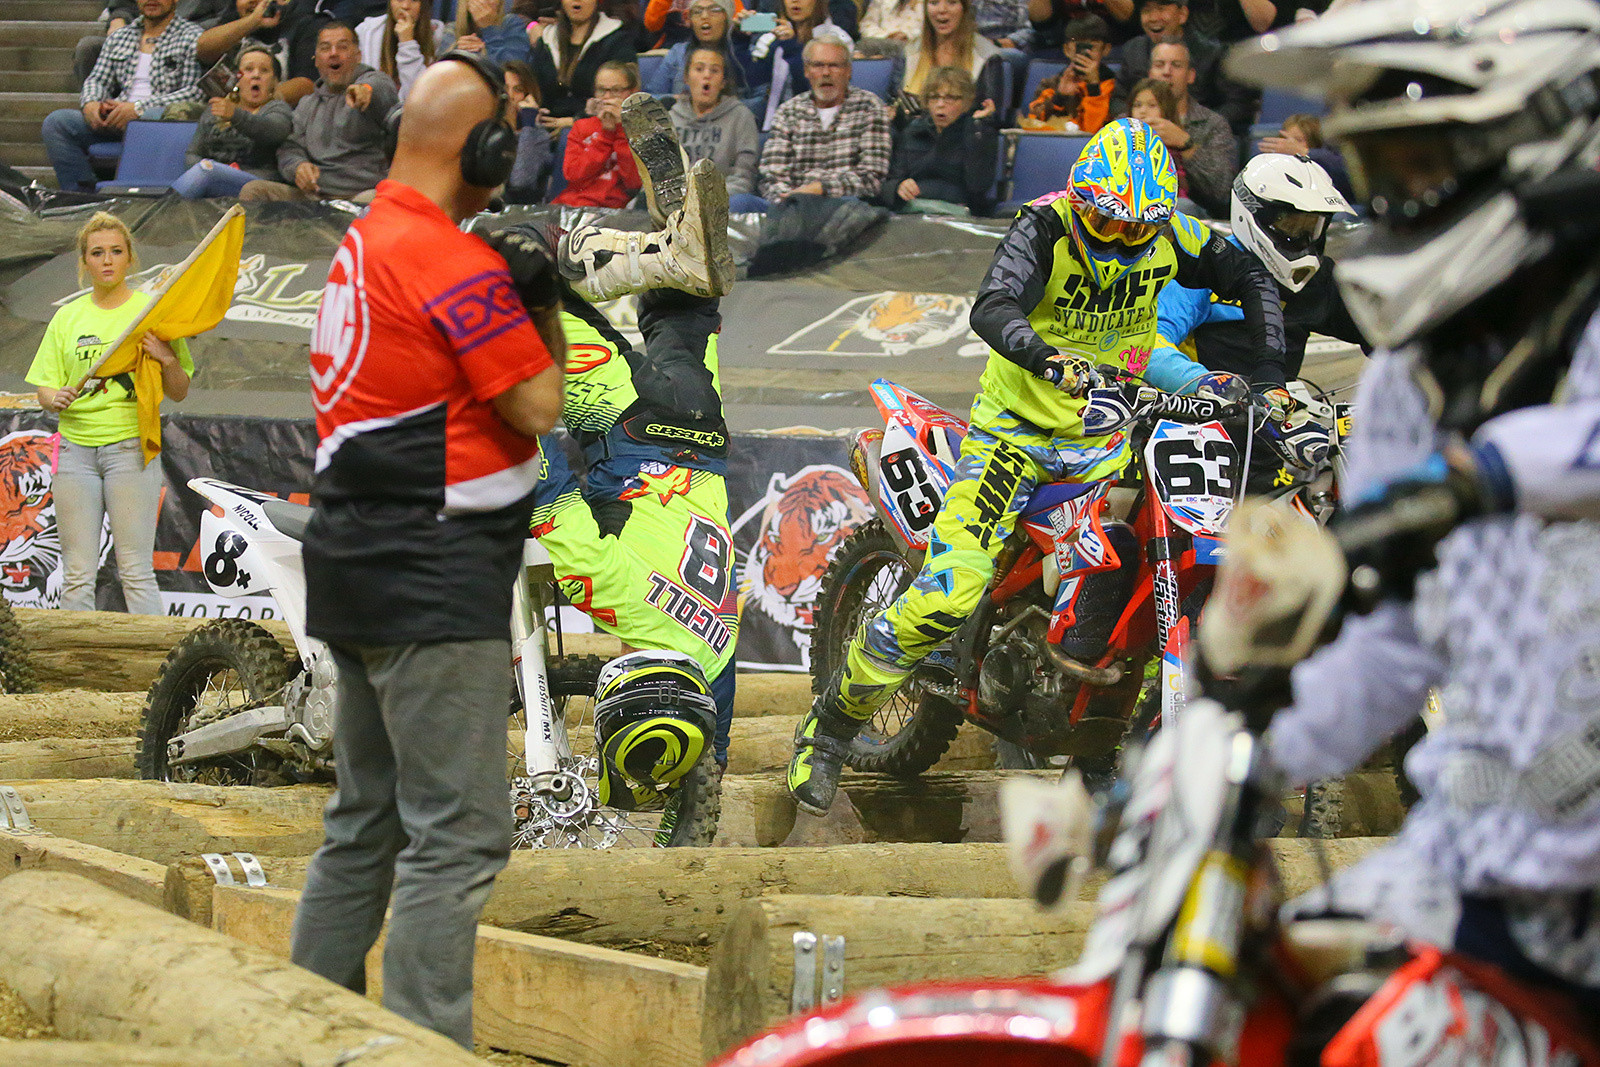 Vet Class 2 - Endurocross Finals - Motocross Pictures - Vital MX